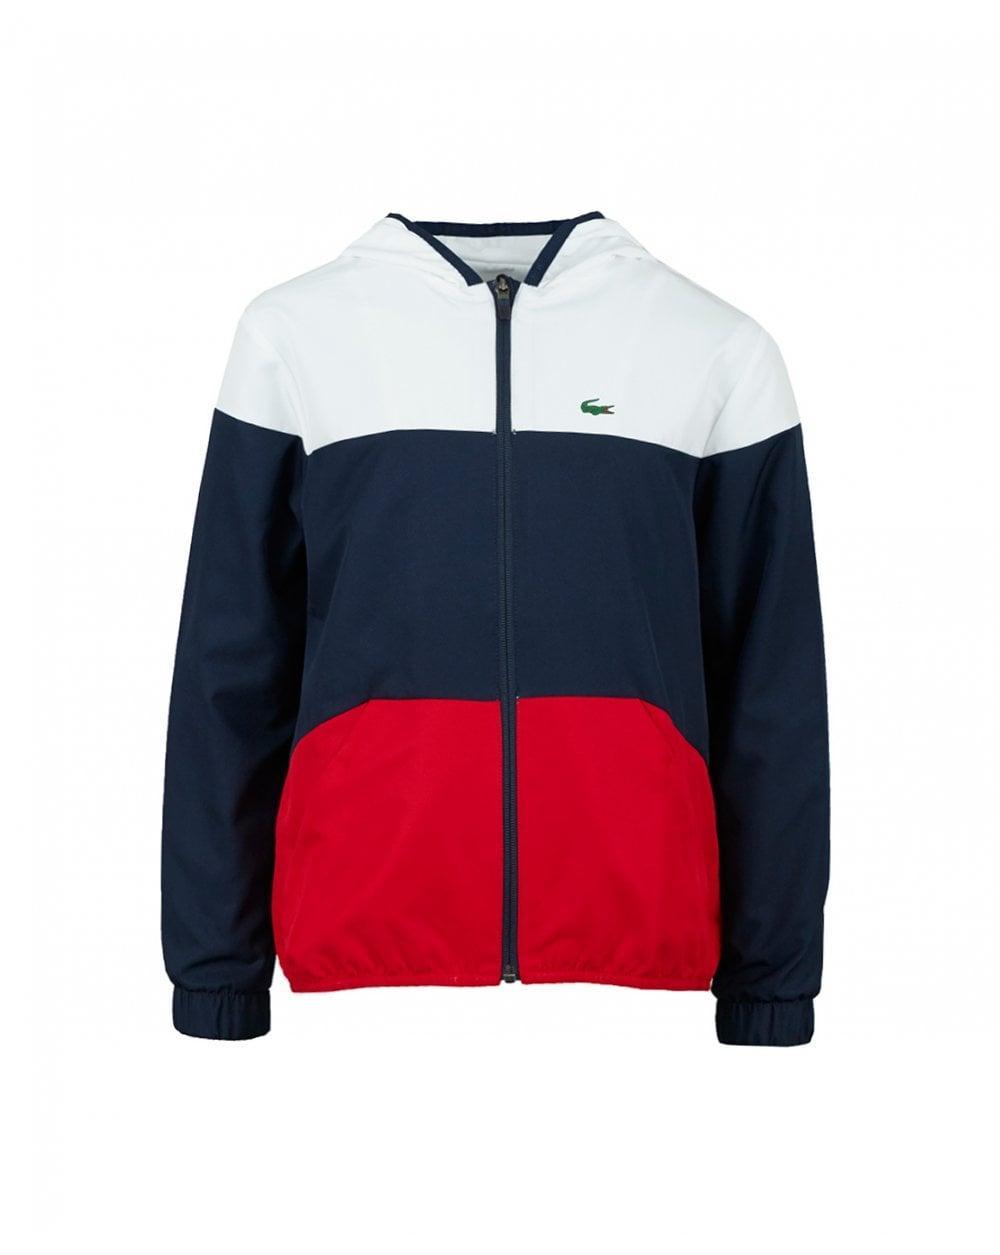 7c8f6fbf72f8 Lacoste Sport Tri Colour Lightweight Jacket in Blue for Men - Lyst